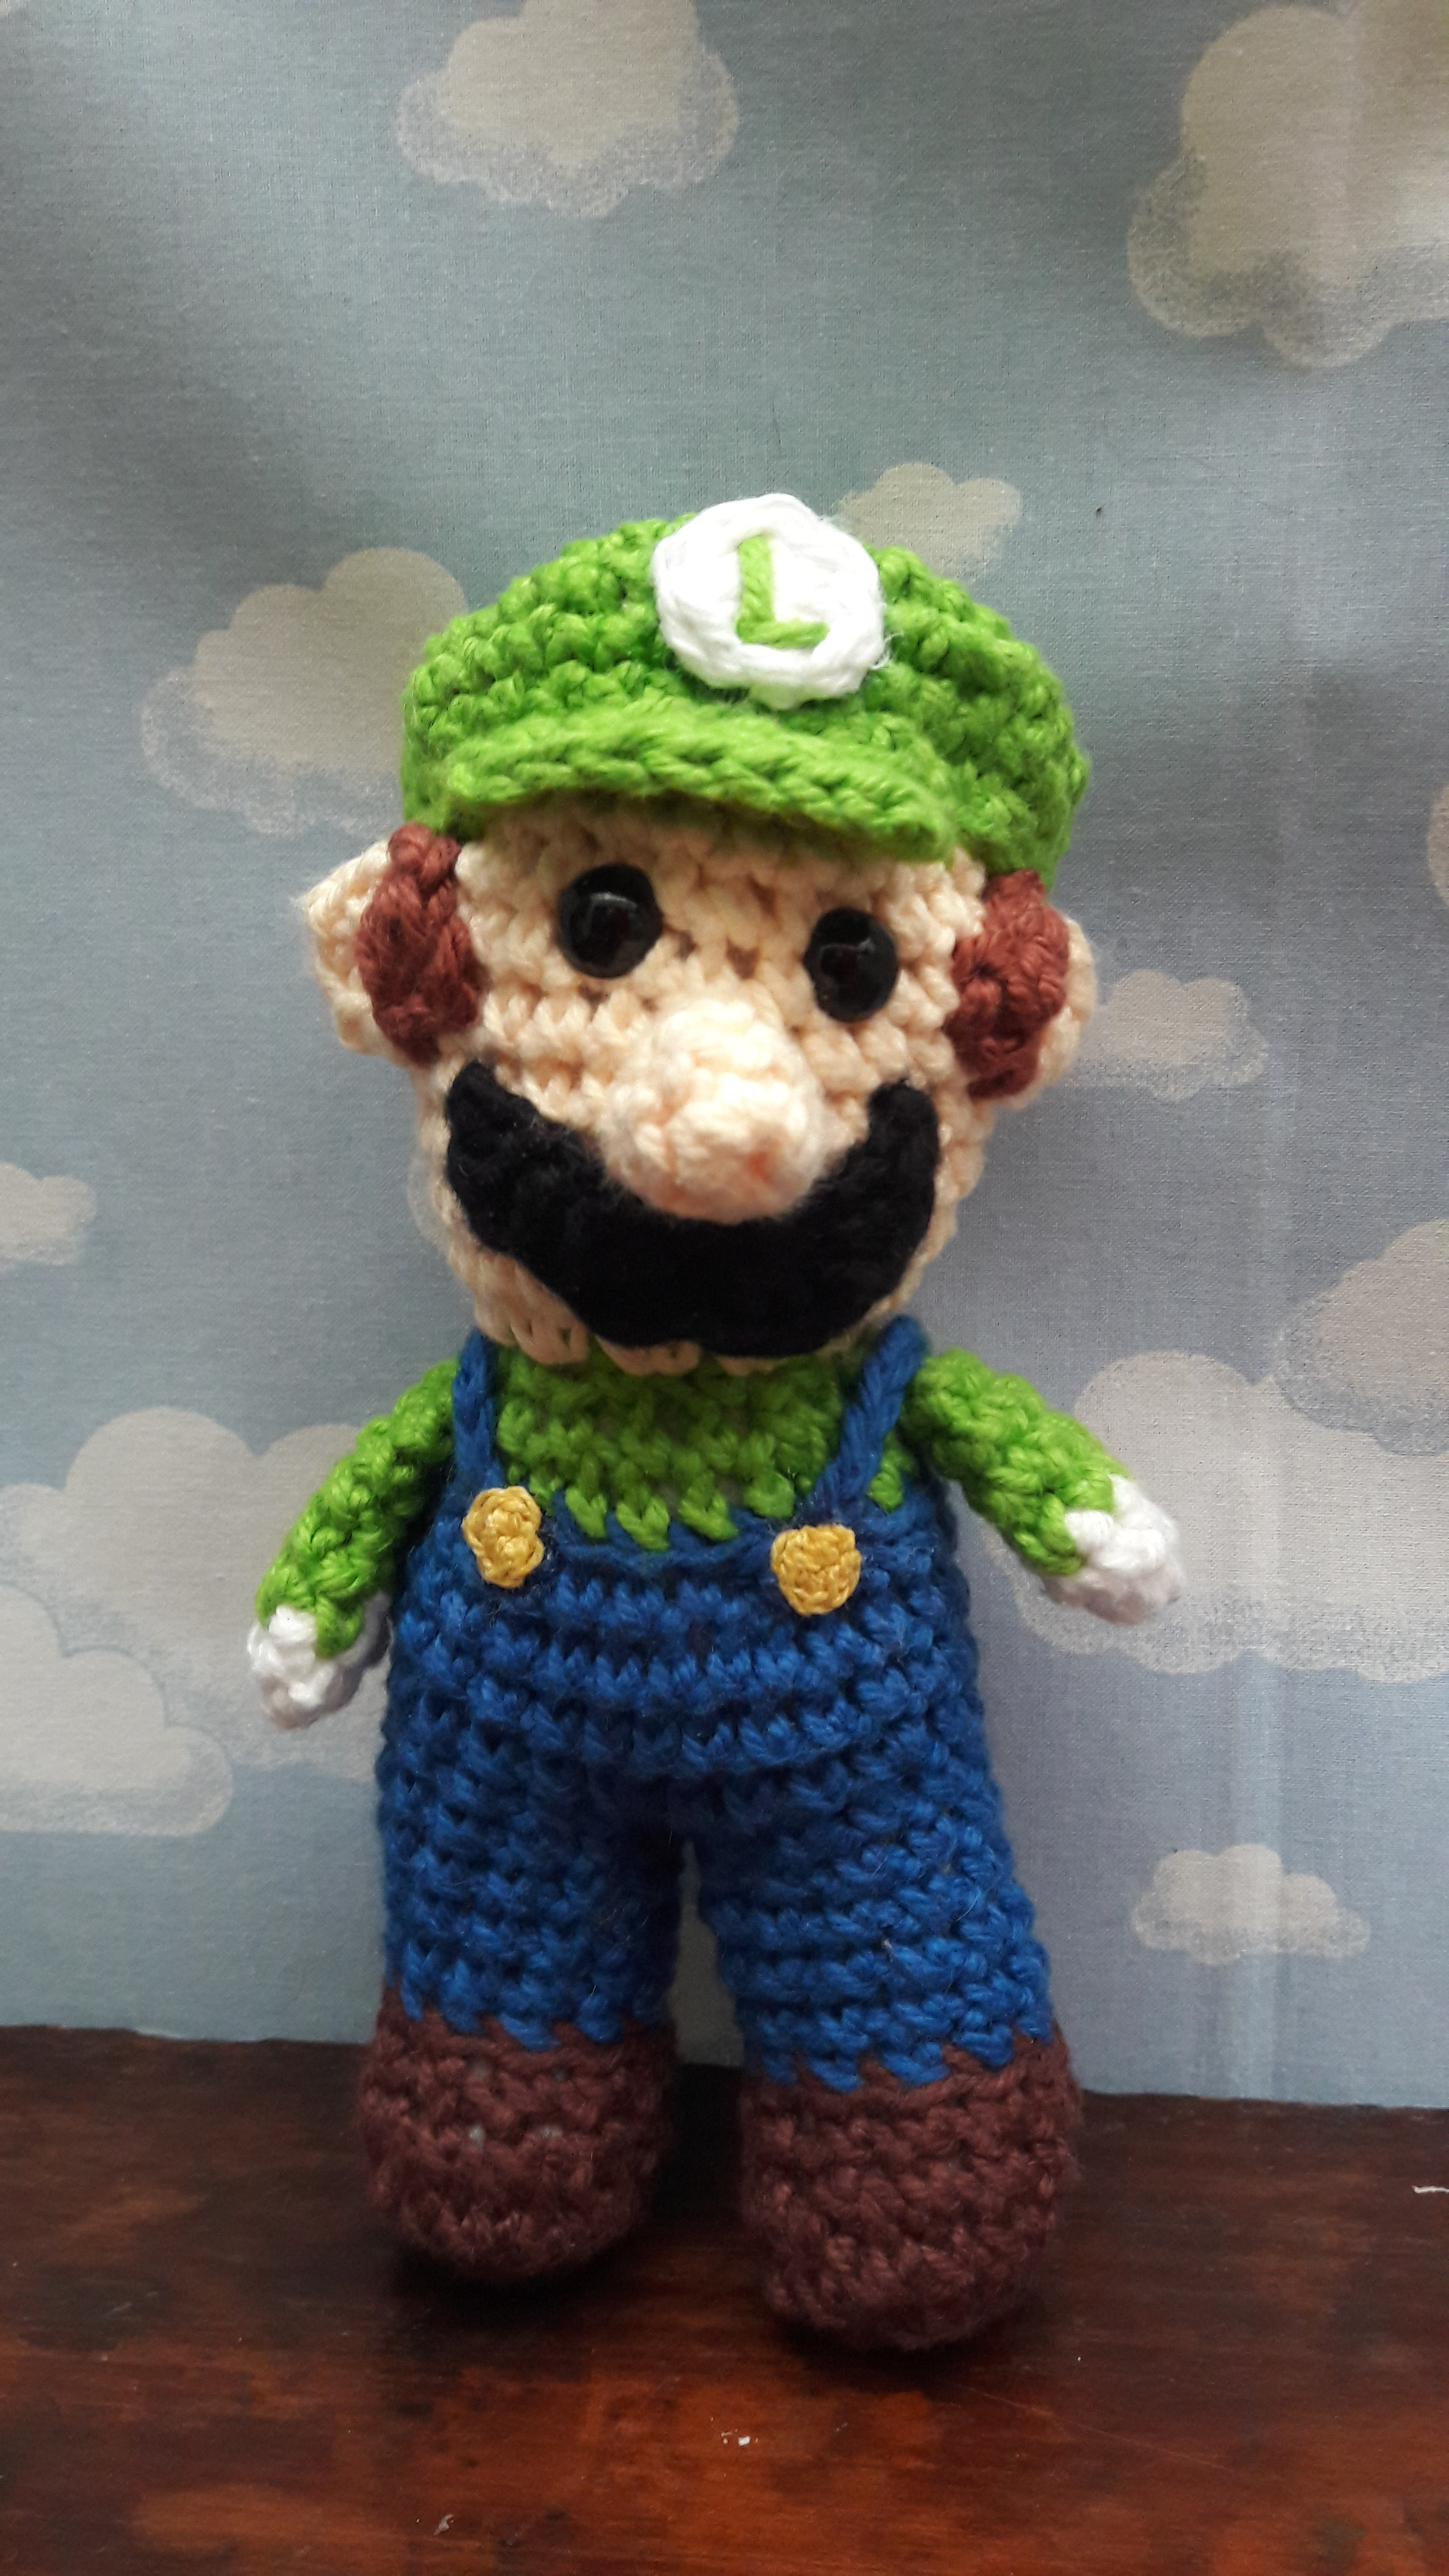 Luigi (With images)   Crochet patterns amigurumi, Crochet, Crochet ...   4128x2322